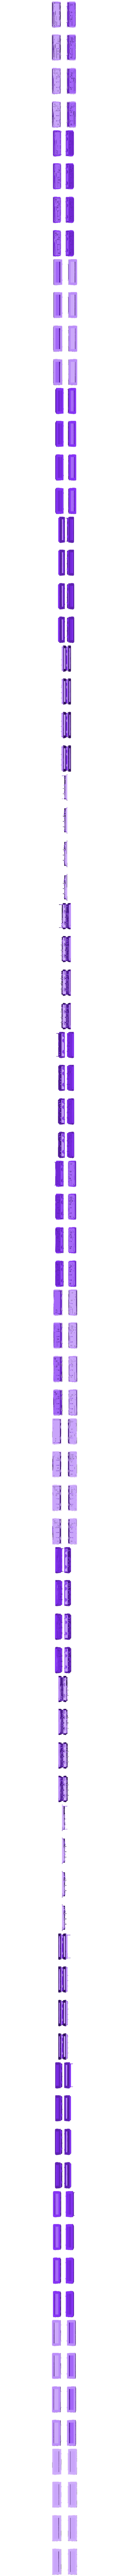 HanSolo_Carbonite_boxsides.stl Download free STL file Han Solo in Carbonite • 3D printing model, ian57